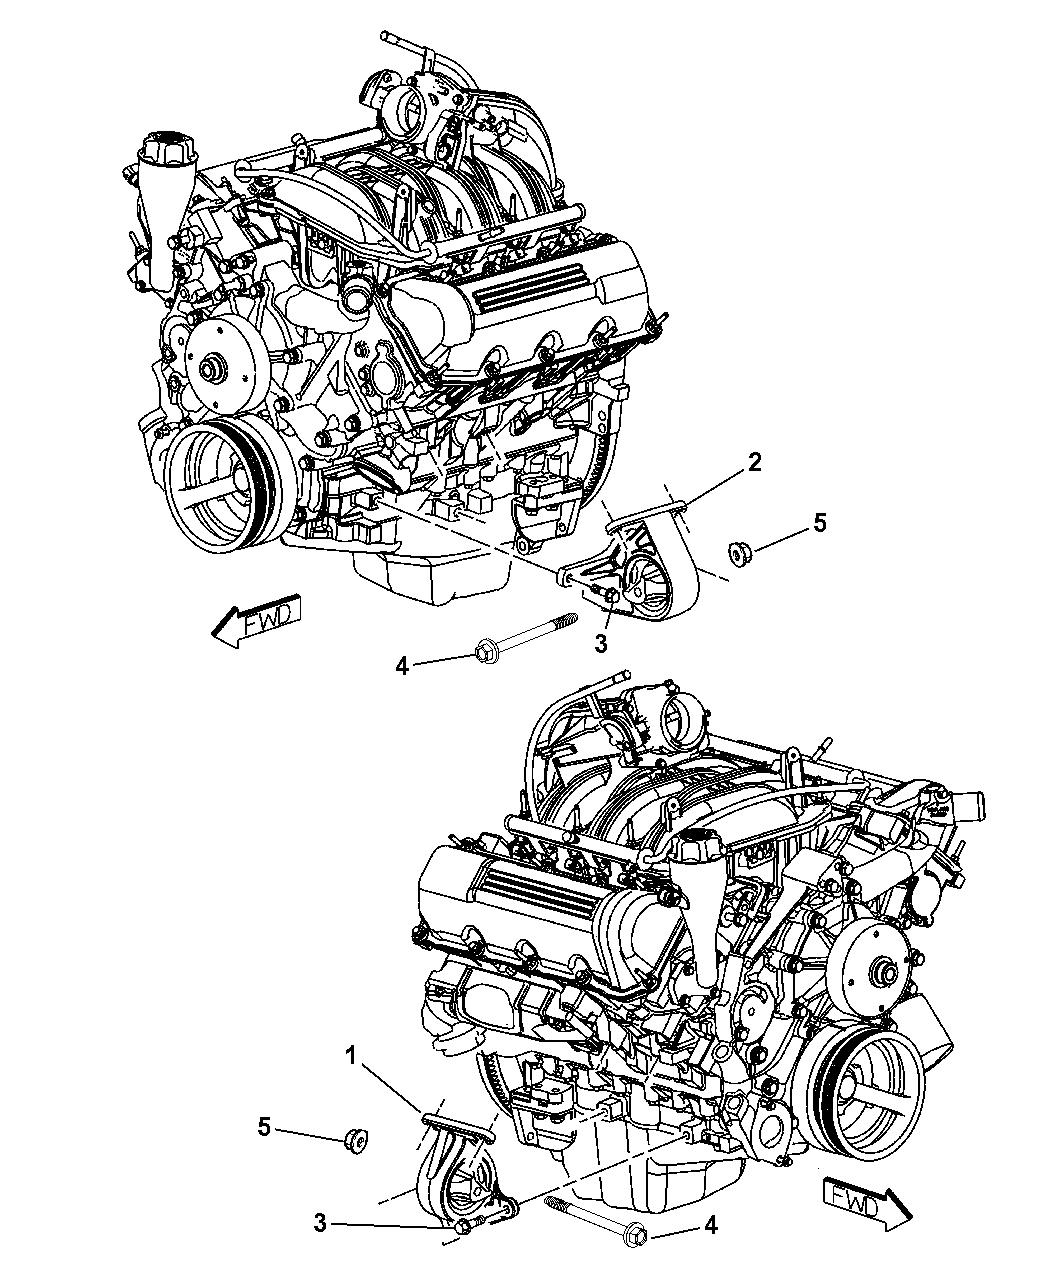 2003 Jeep Liberty Engine Diagram